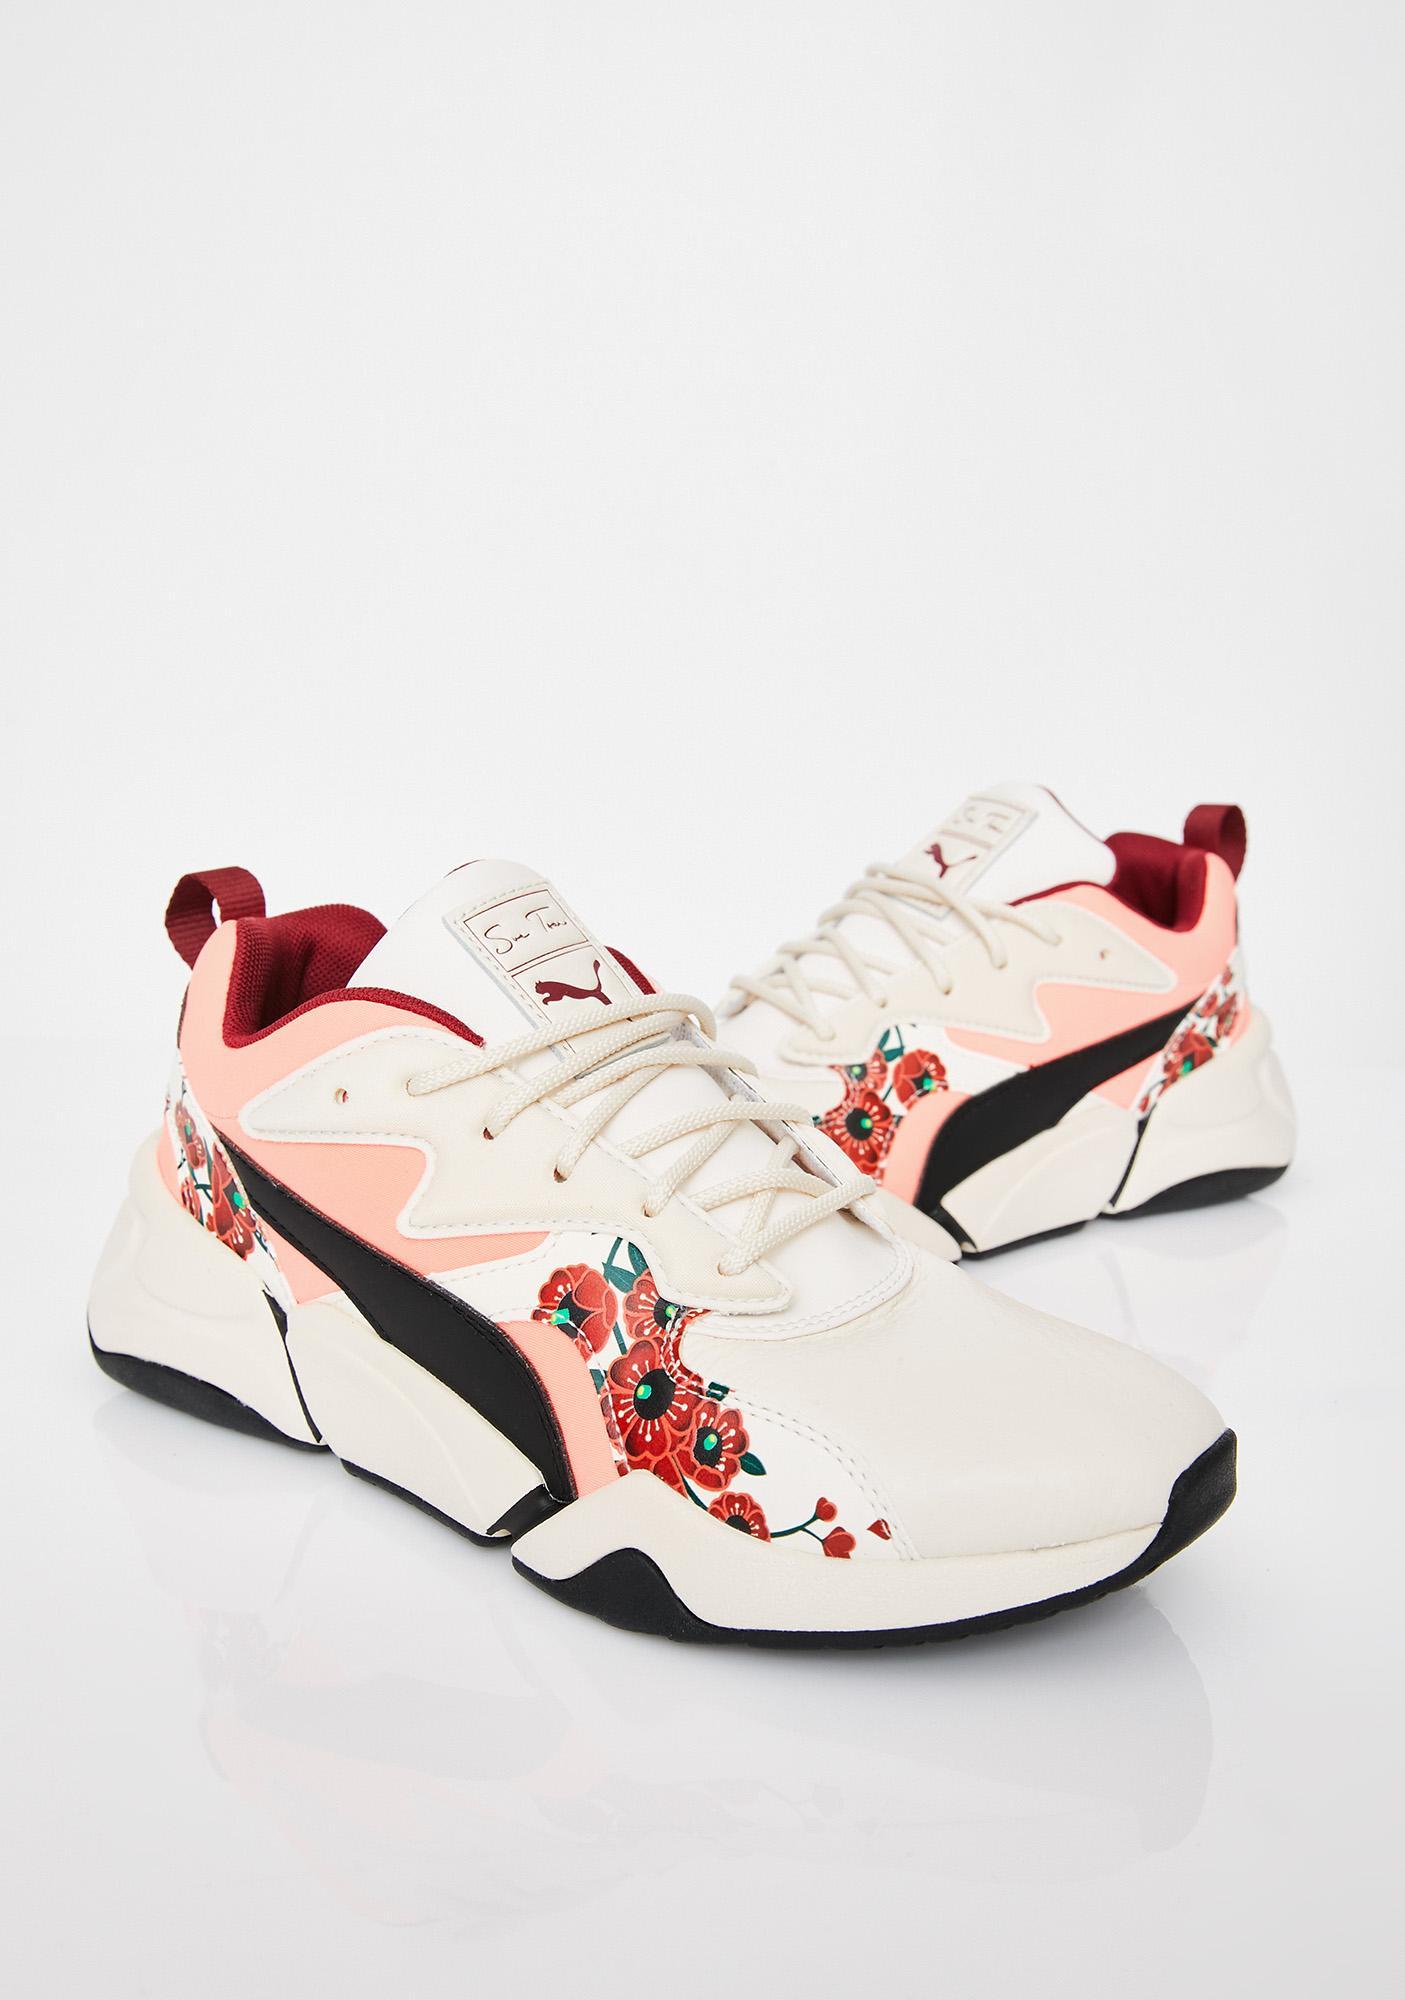 70192a087465 PUMA x S.Tsai Nova Cherry Bombs Sneakers